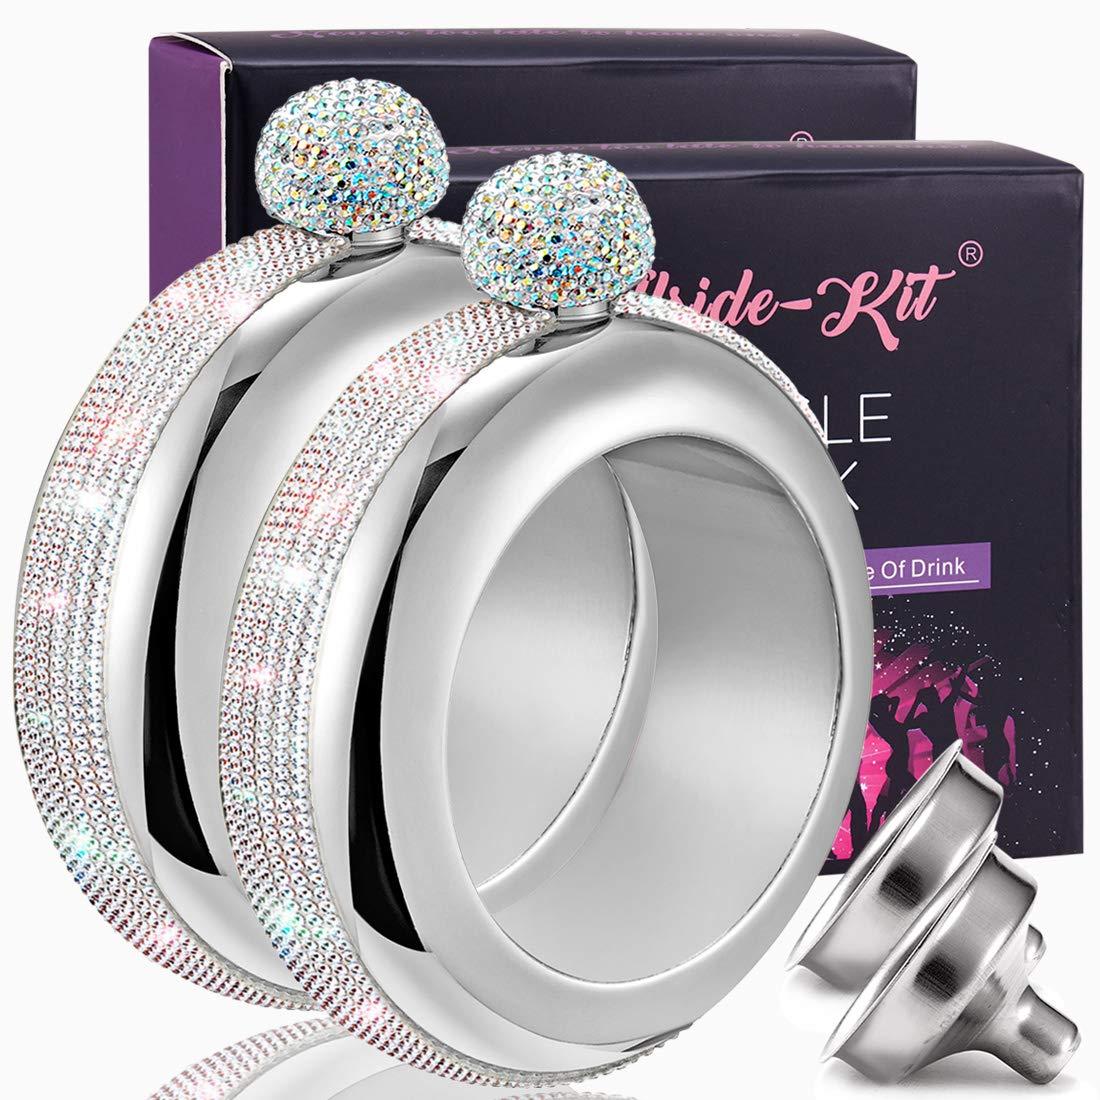 Booze Shot Flask Bangle Bracelet- AB Crystal Lid Creative 304 Stainless Steel Wine Alcohol Liquor Flask bracelet for Women Girls Party Hidden Flask Set 3.5OZ-2PCS (silver stones-2)